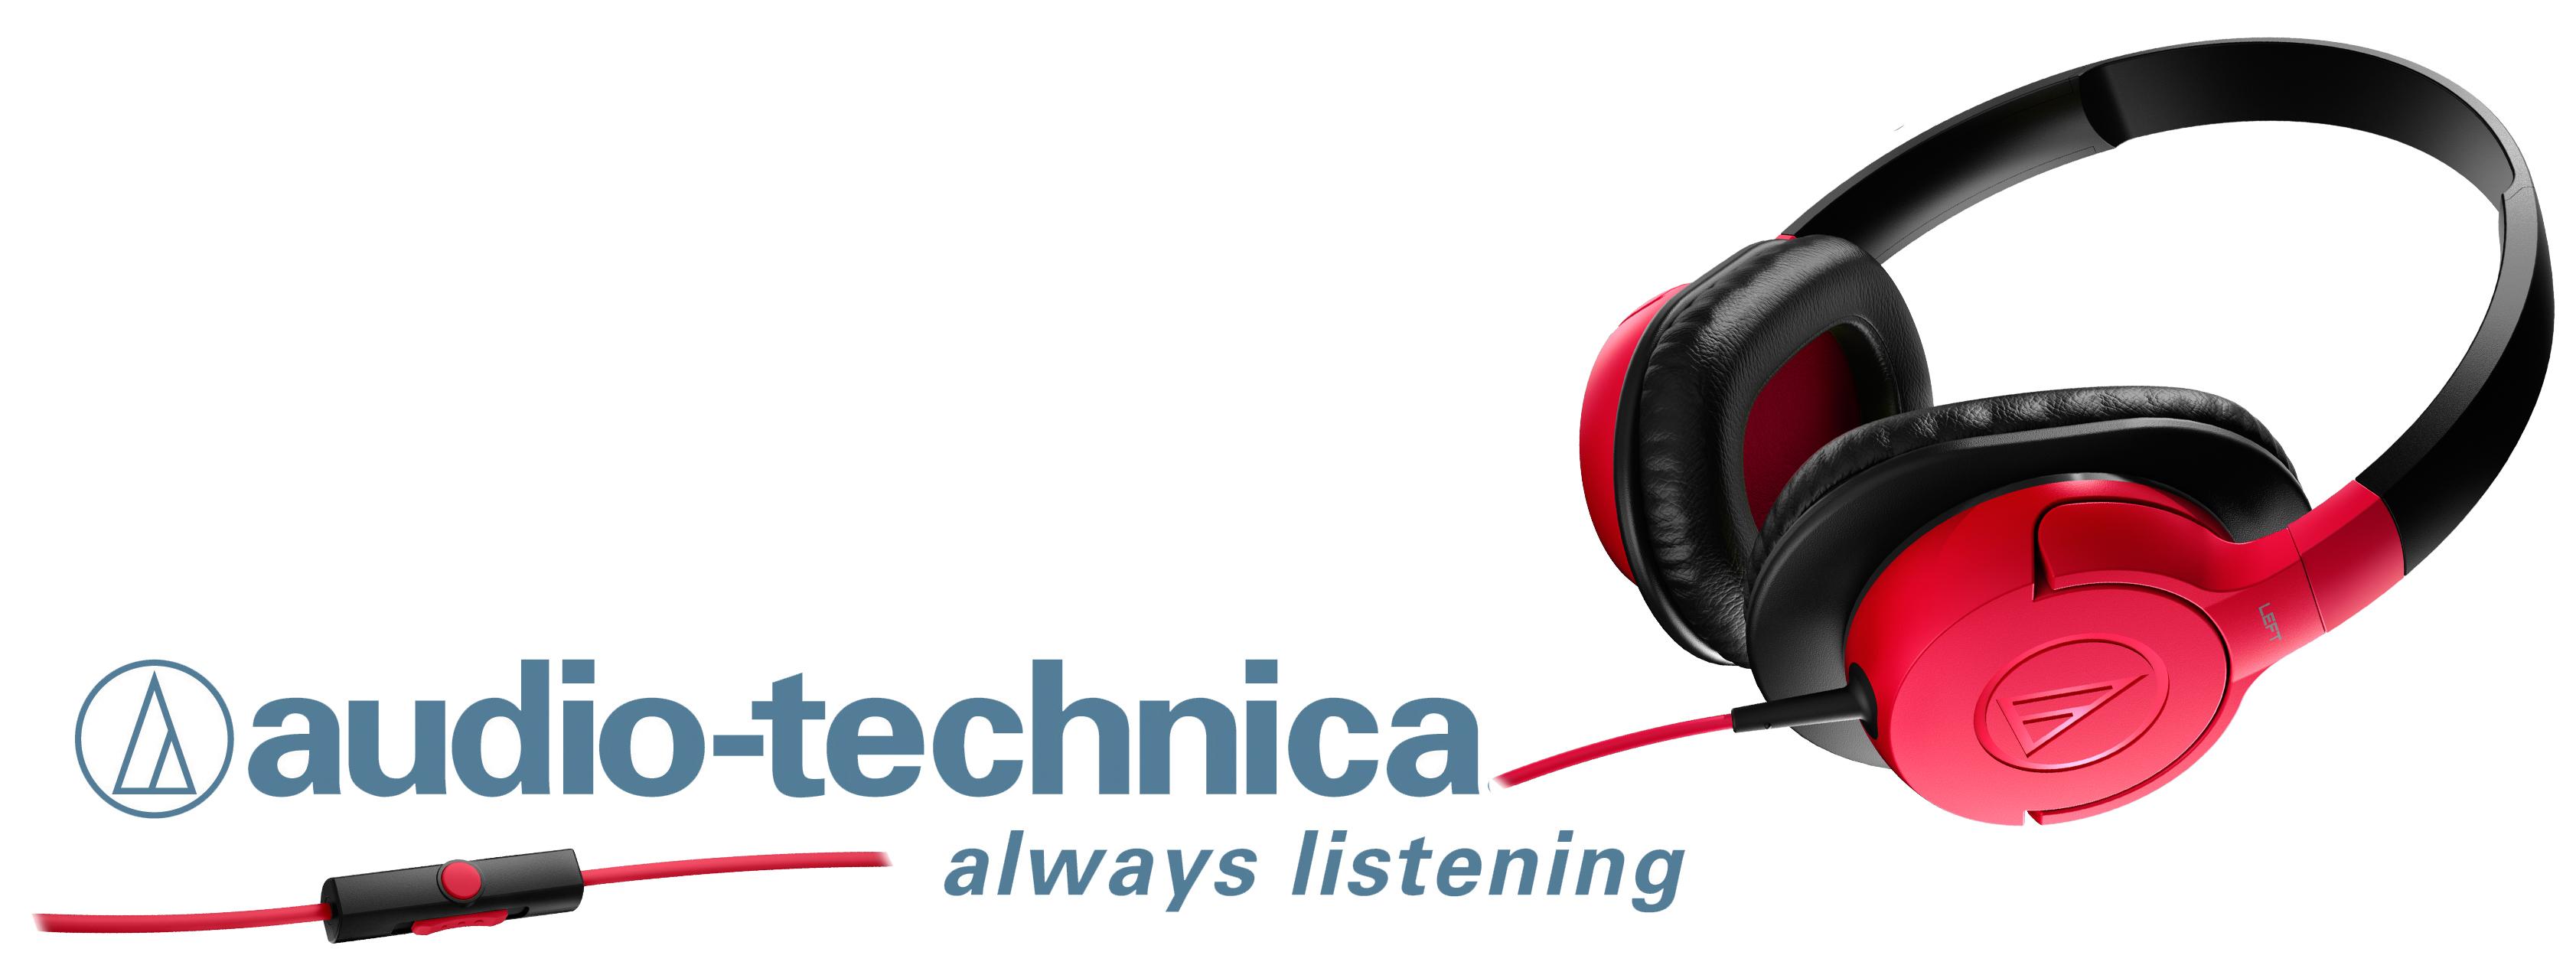 Audio-technica ATH-AX1iSGY